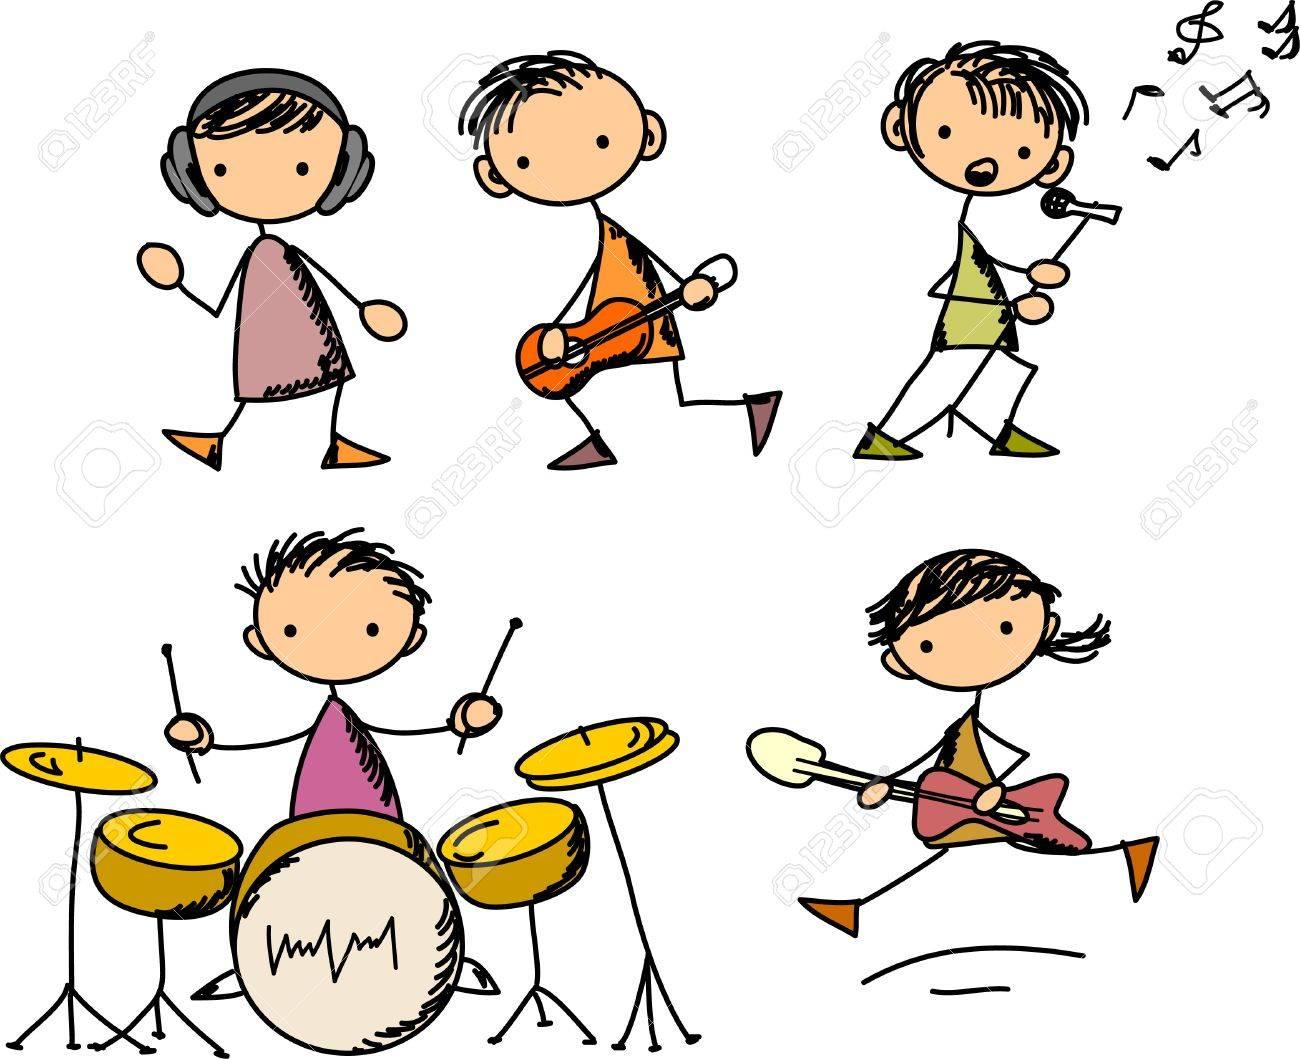 Music Doodles Stock Vector - 11499183